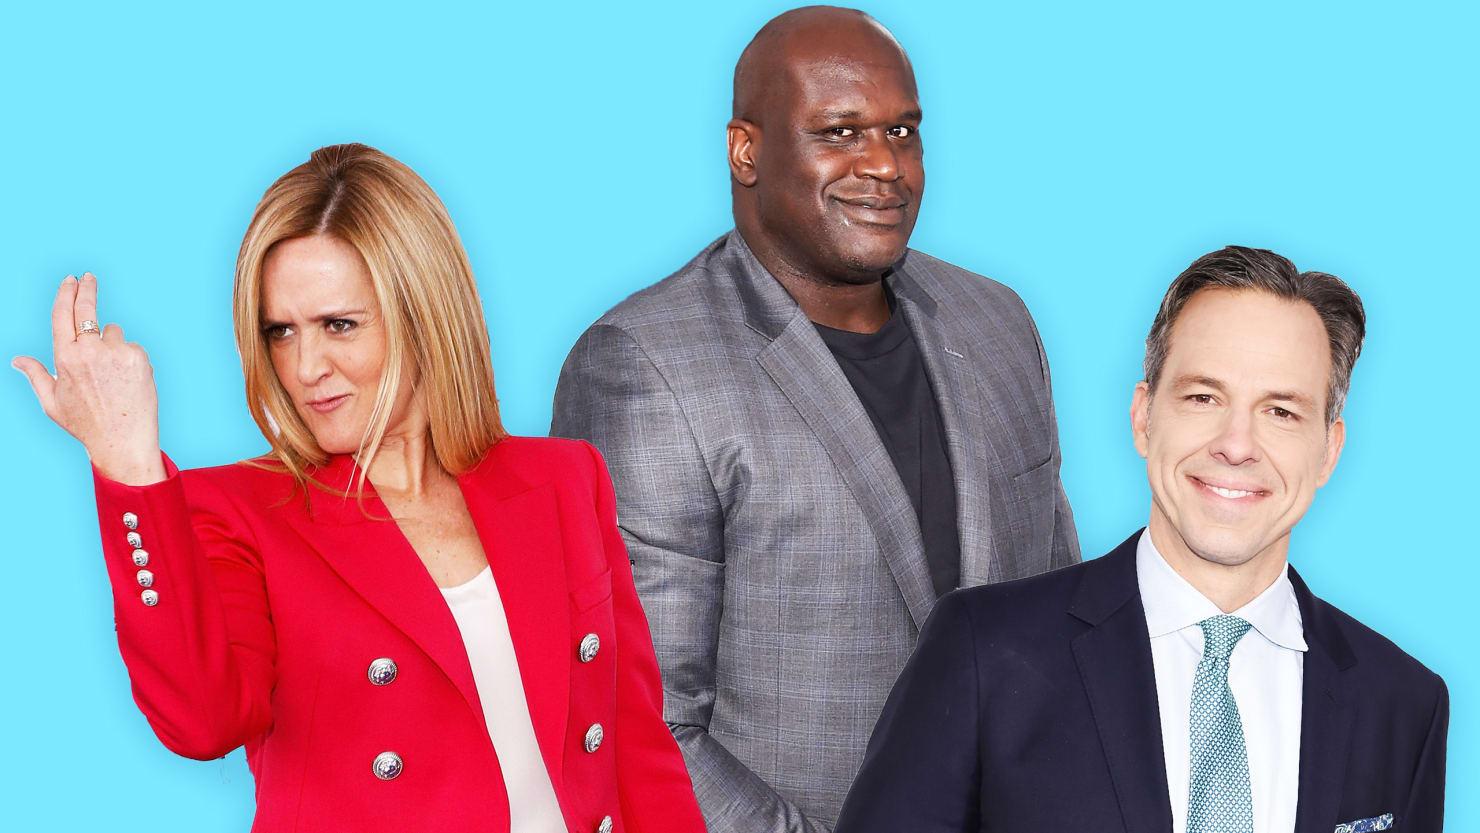 'I'm Shocked': Samantha Bee, Shaq, Jake Tapper and More Talk Life Under President Trump